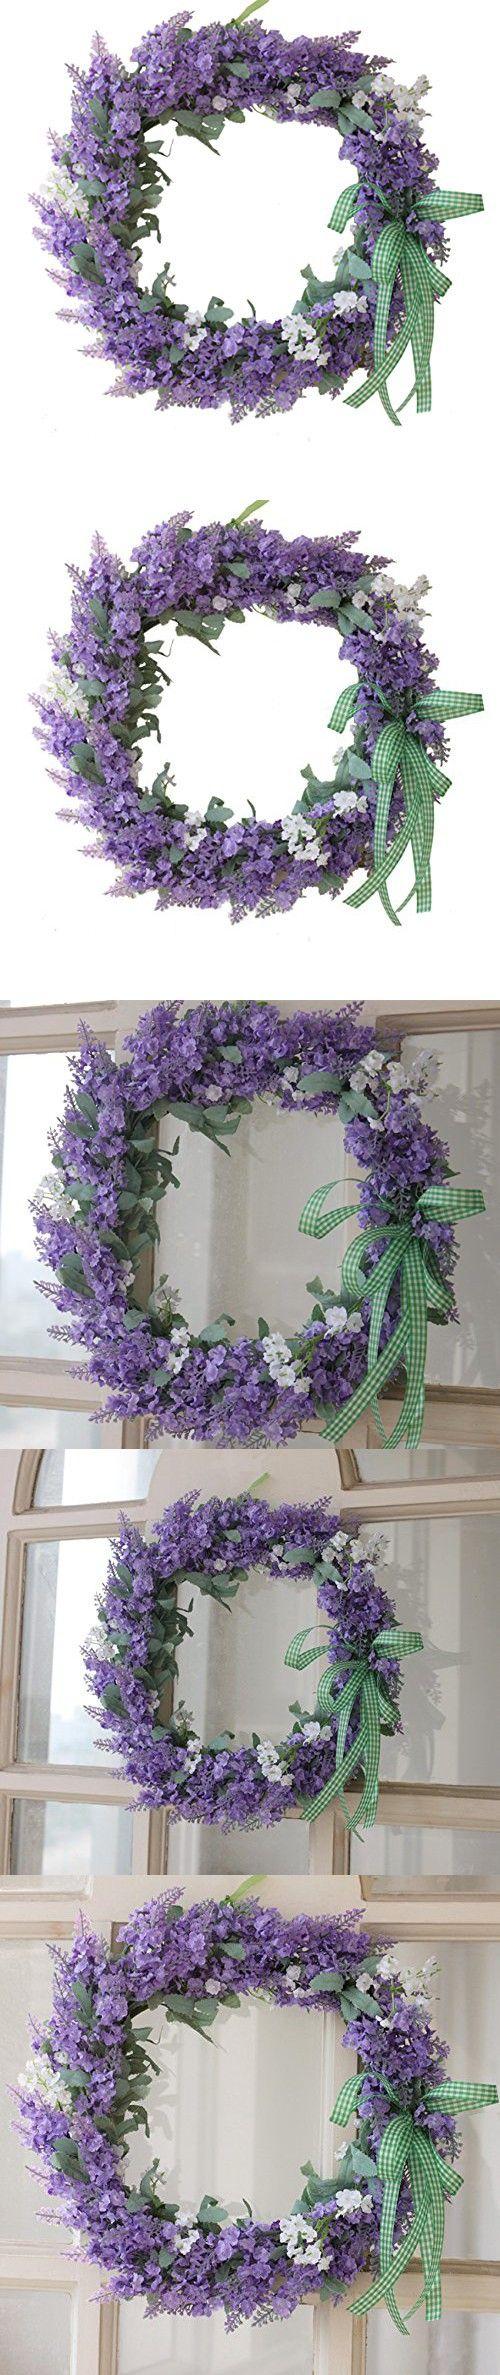 Wedding decorations home  Florist Flower Wreath Rose Garland for Home Wall Wedding Decoration